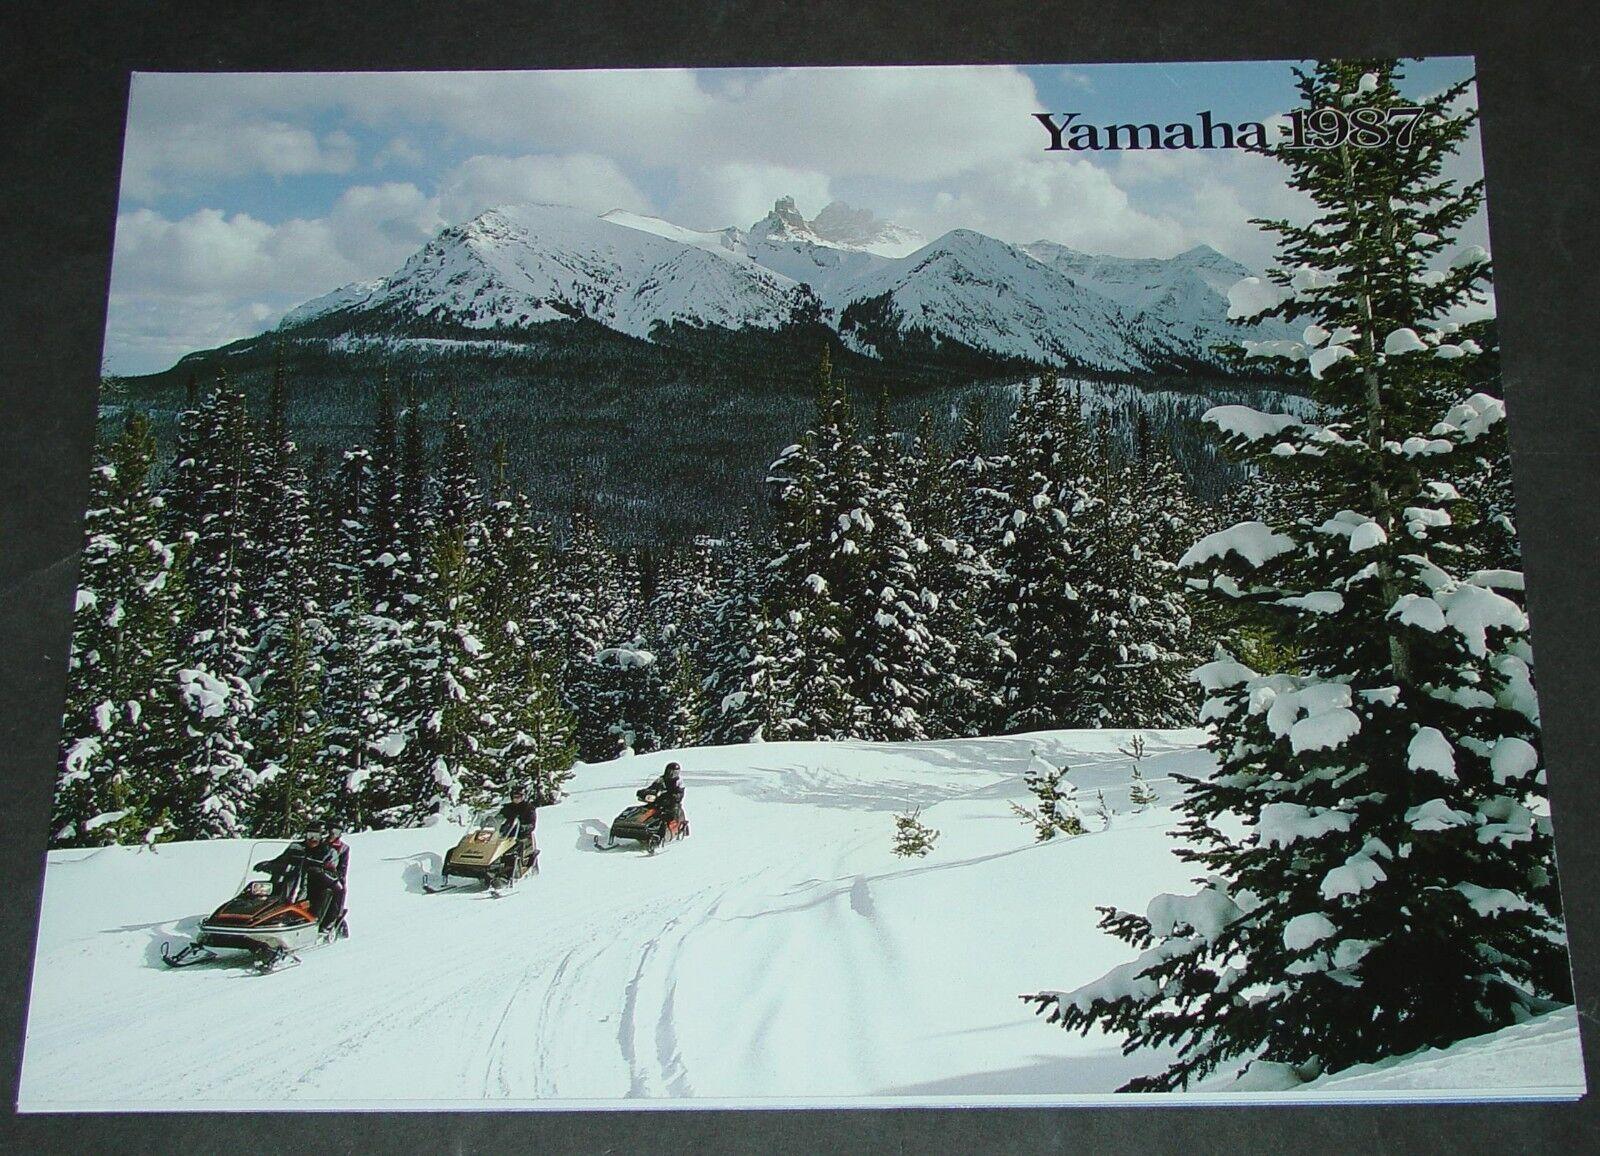 VINTAGE 1987 YAMAHA SNOWMOBILE SALES BROCHURE POSTER SIZE 17  X 44    (462)